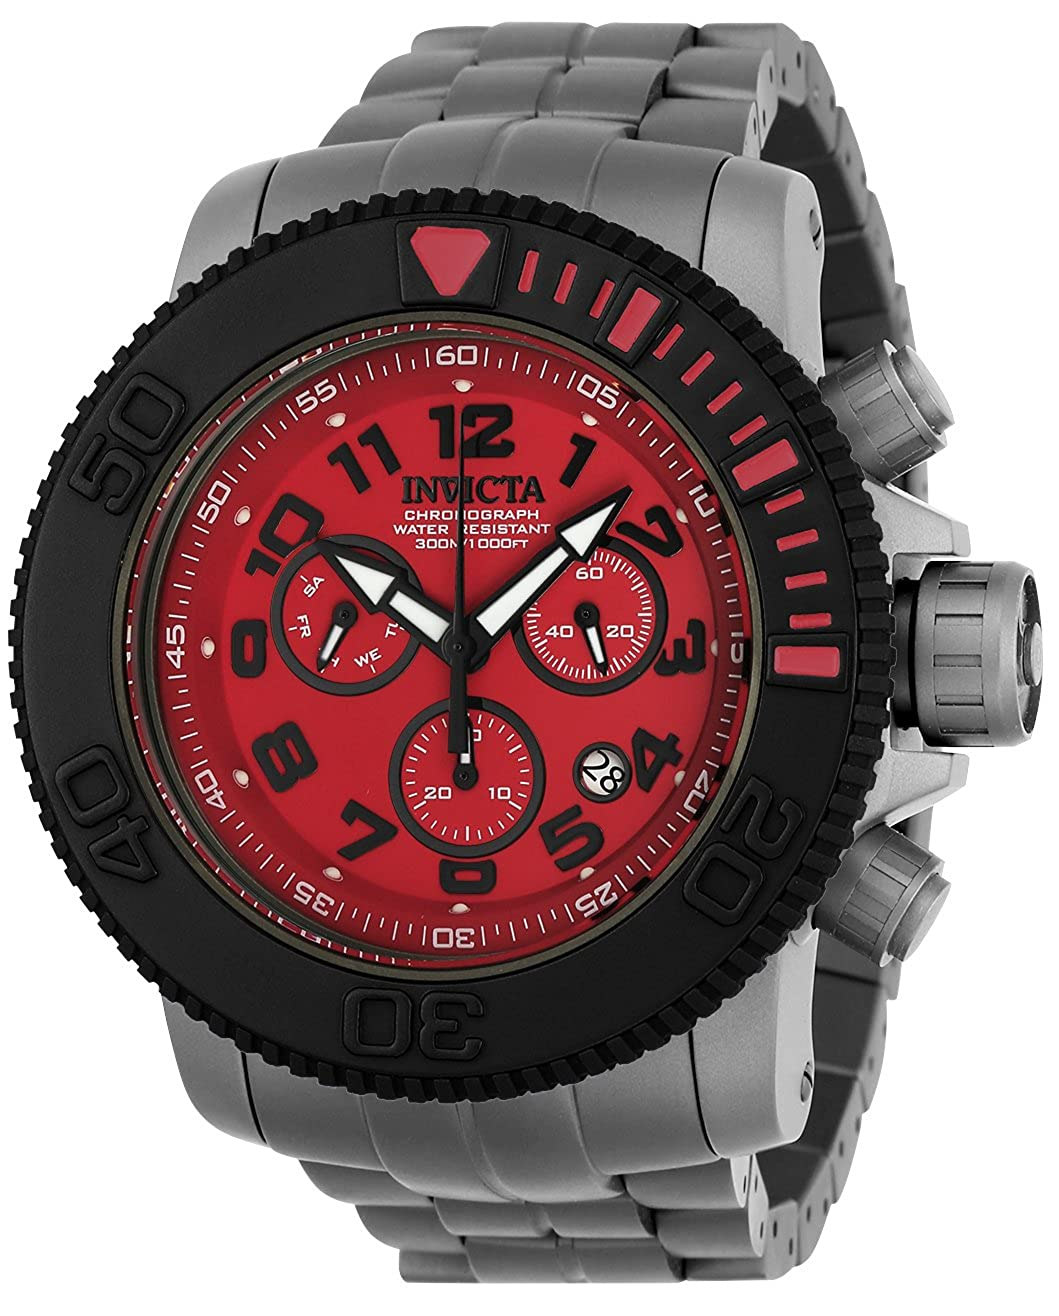 Invicta Men s Sea Hunter Quartz Watch with Titanium Strap, Grey, 29 Model 23144